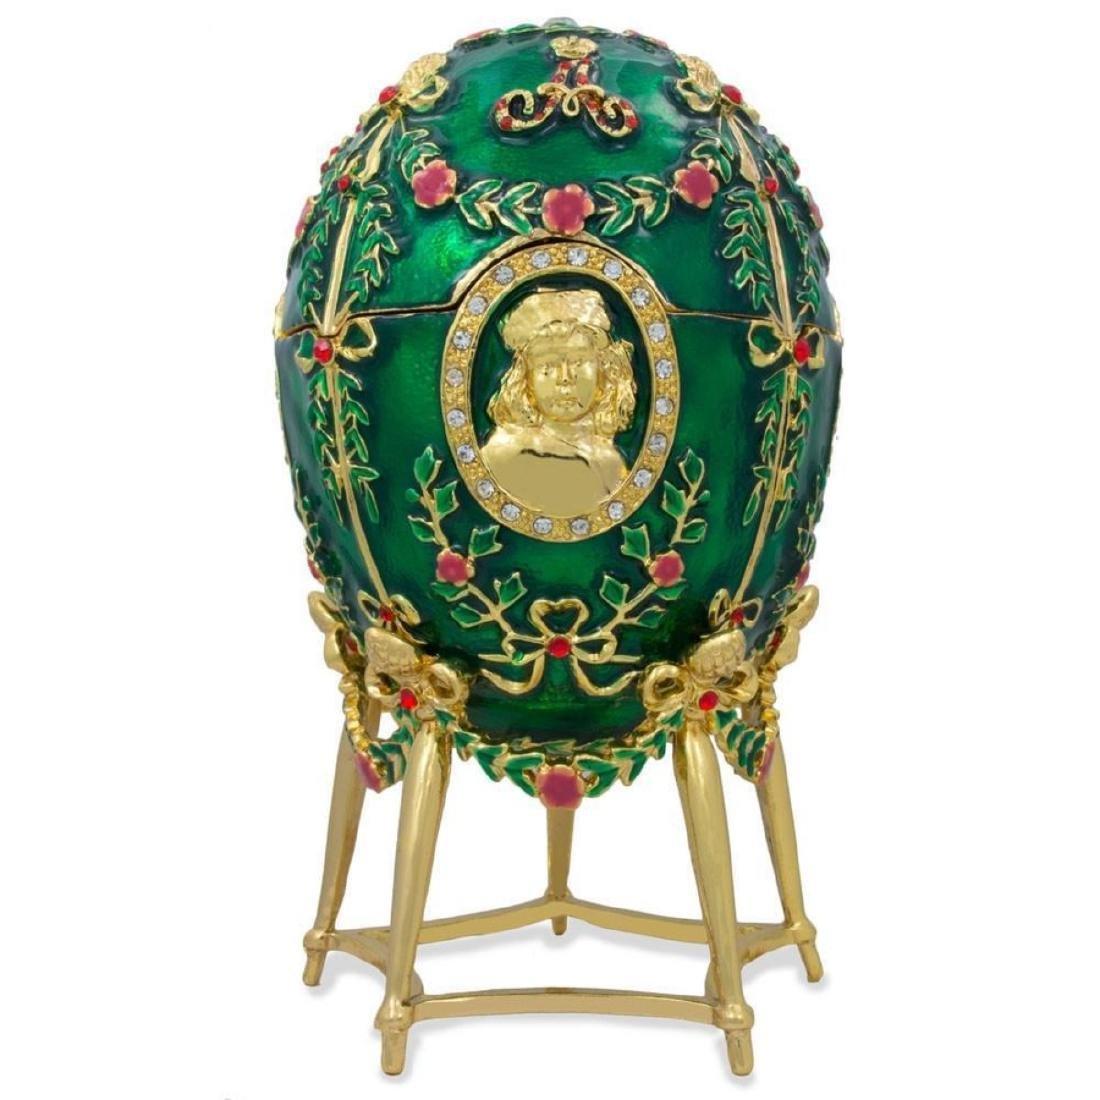 Faberge Inspired 1908 Alexander Palace Faberge Egg - 3